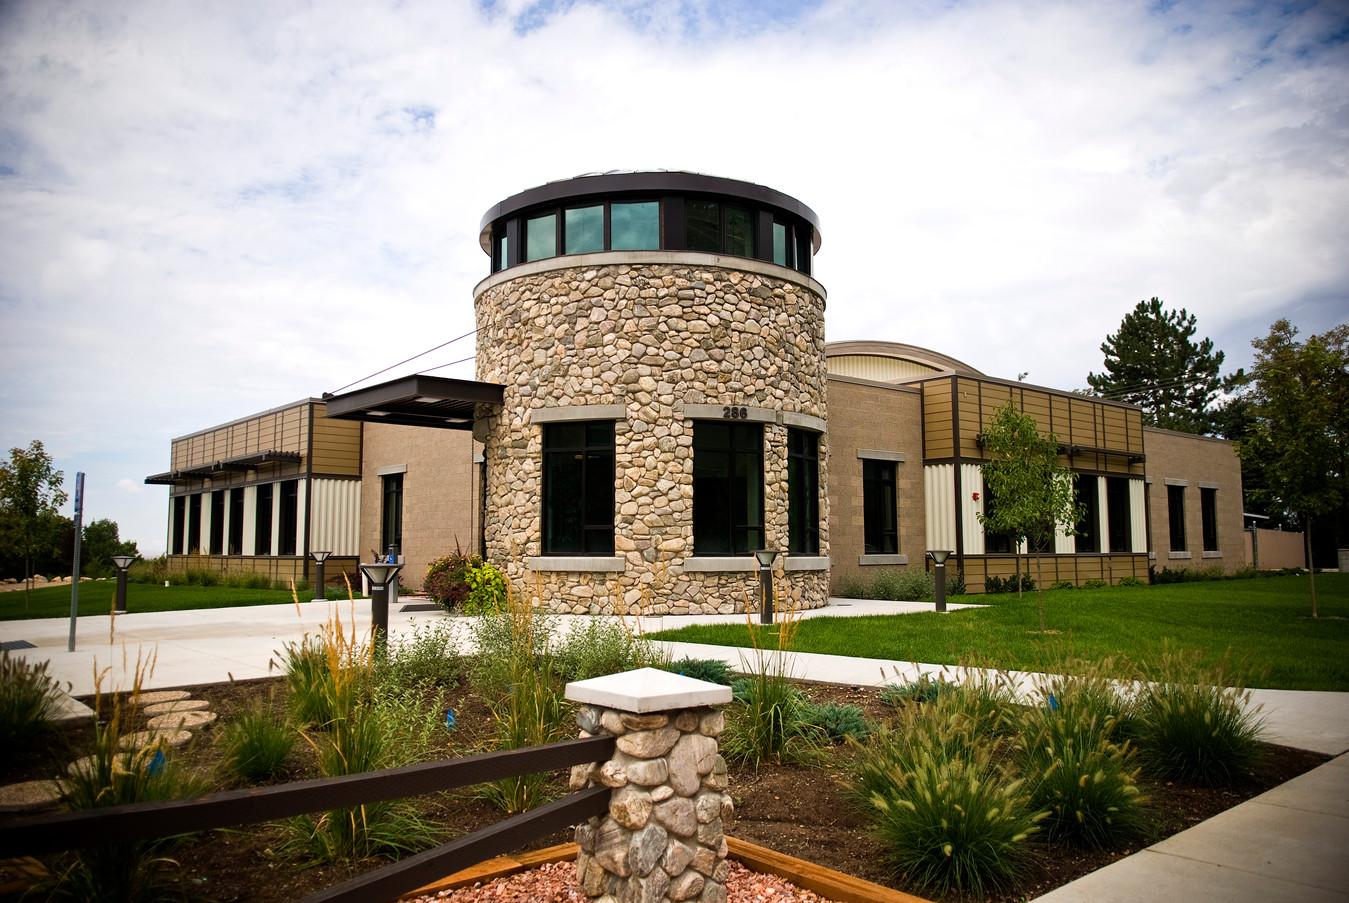 Farmington Police Station